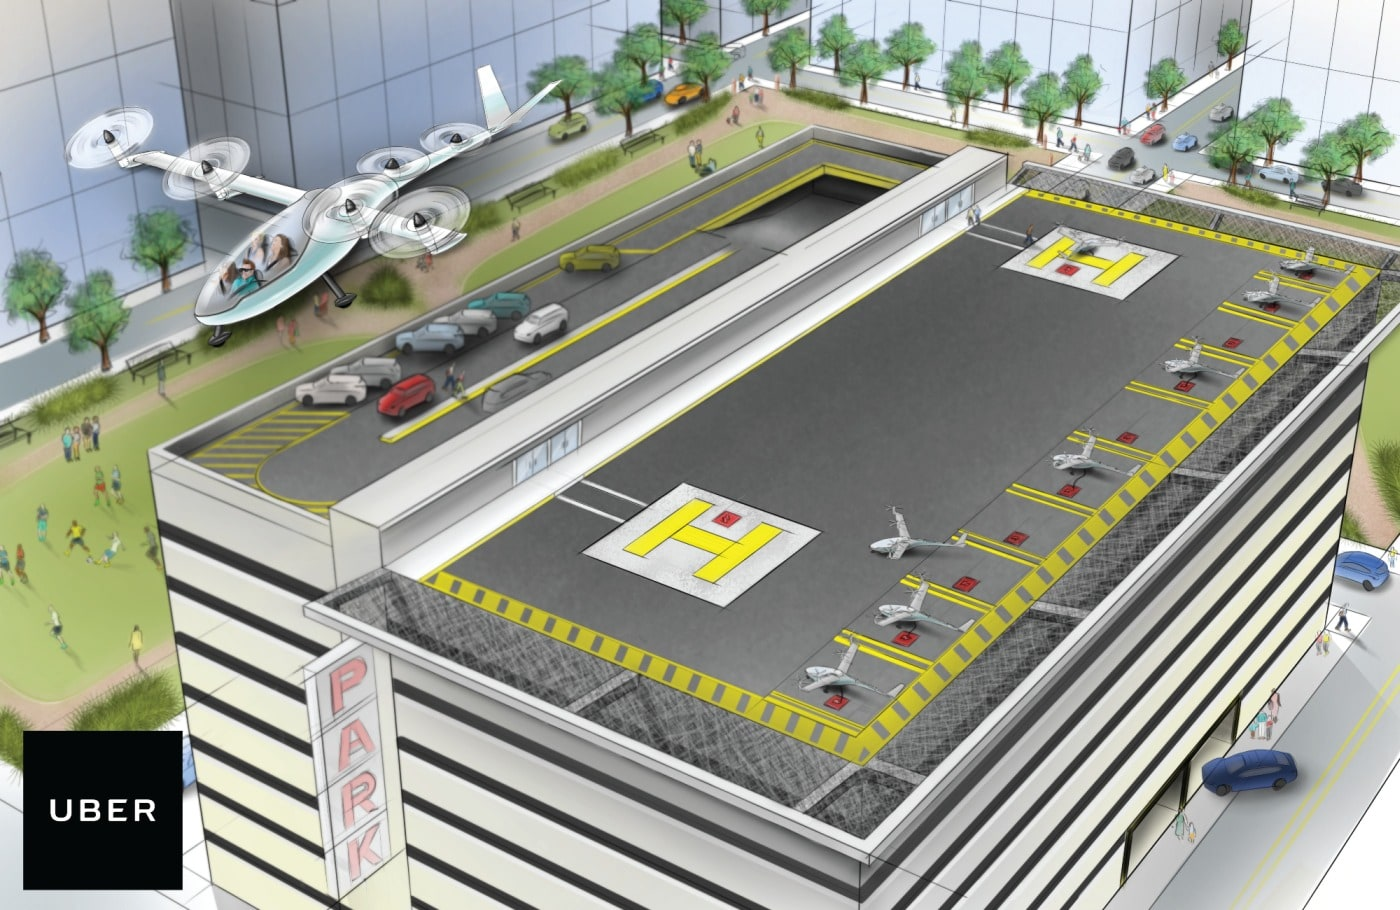 Uber hires a NASA guru to help it understand flying cars